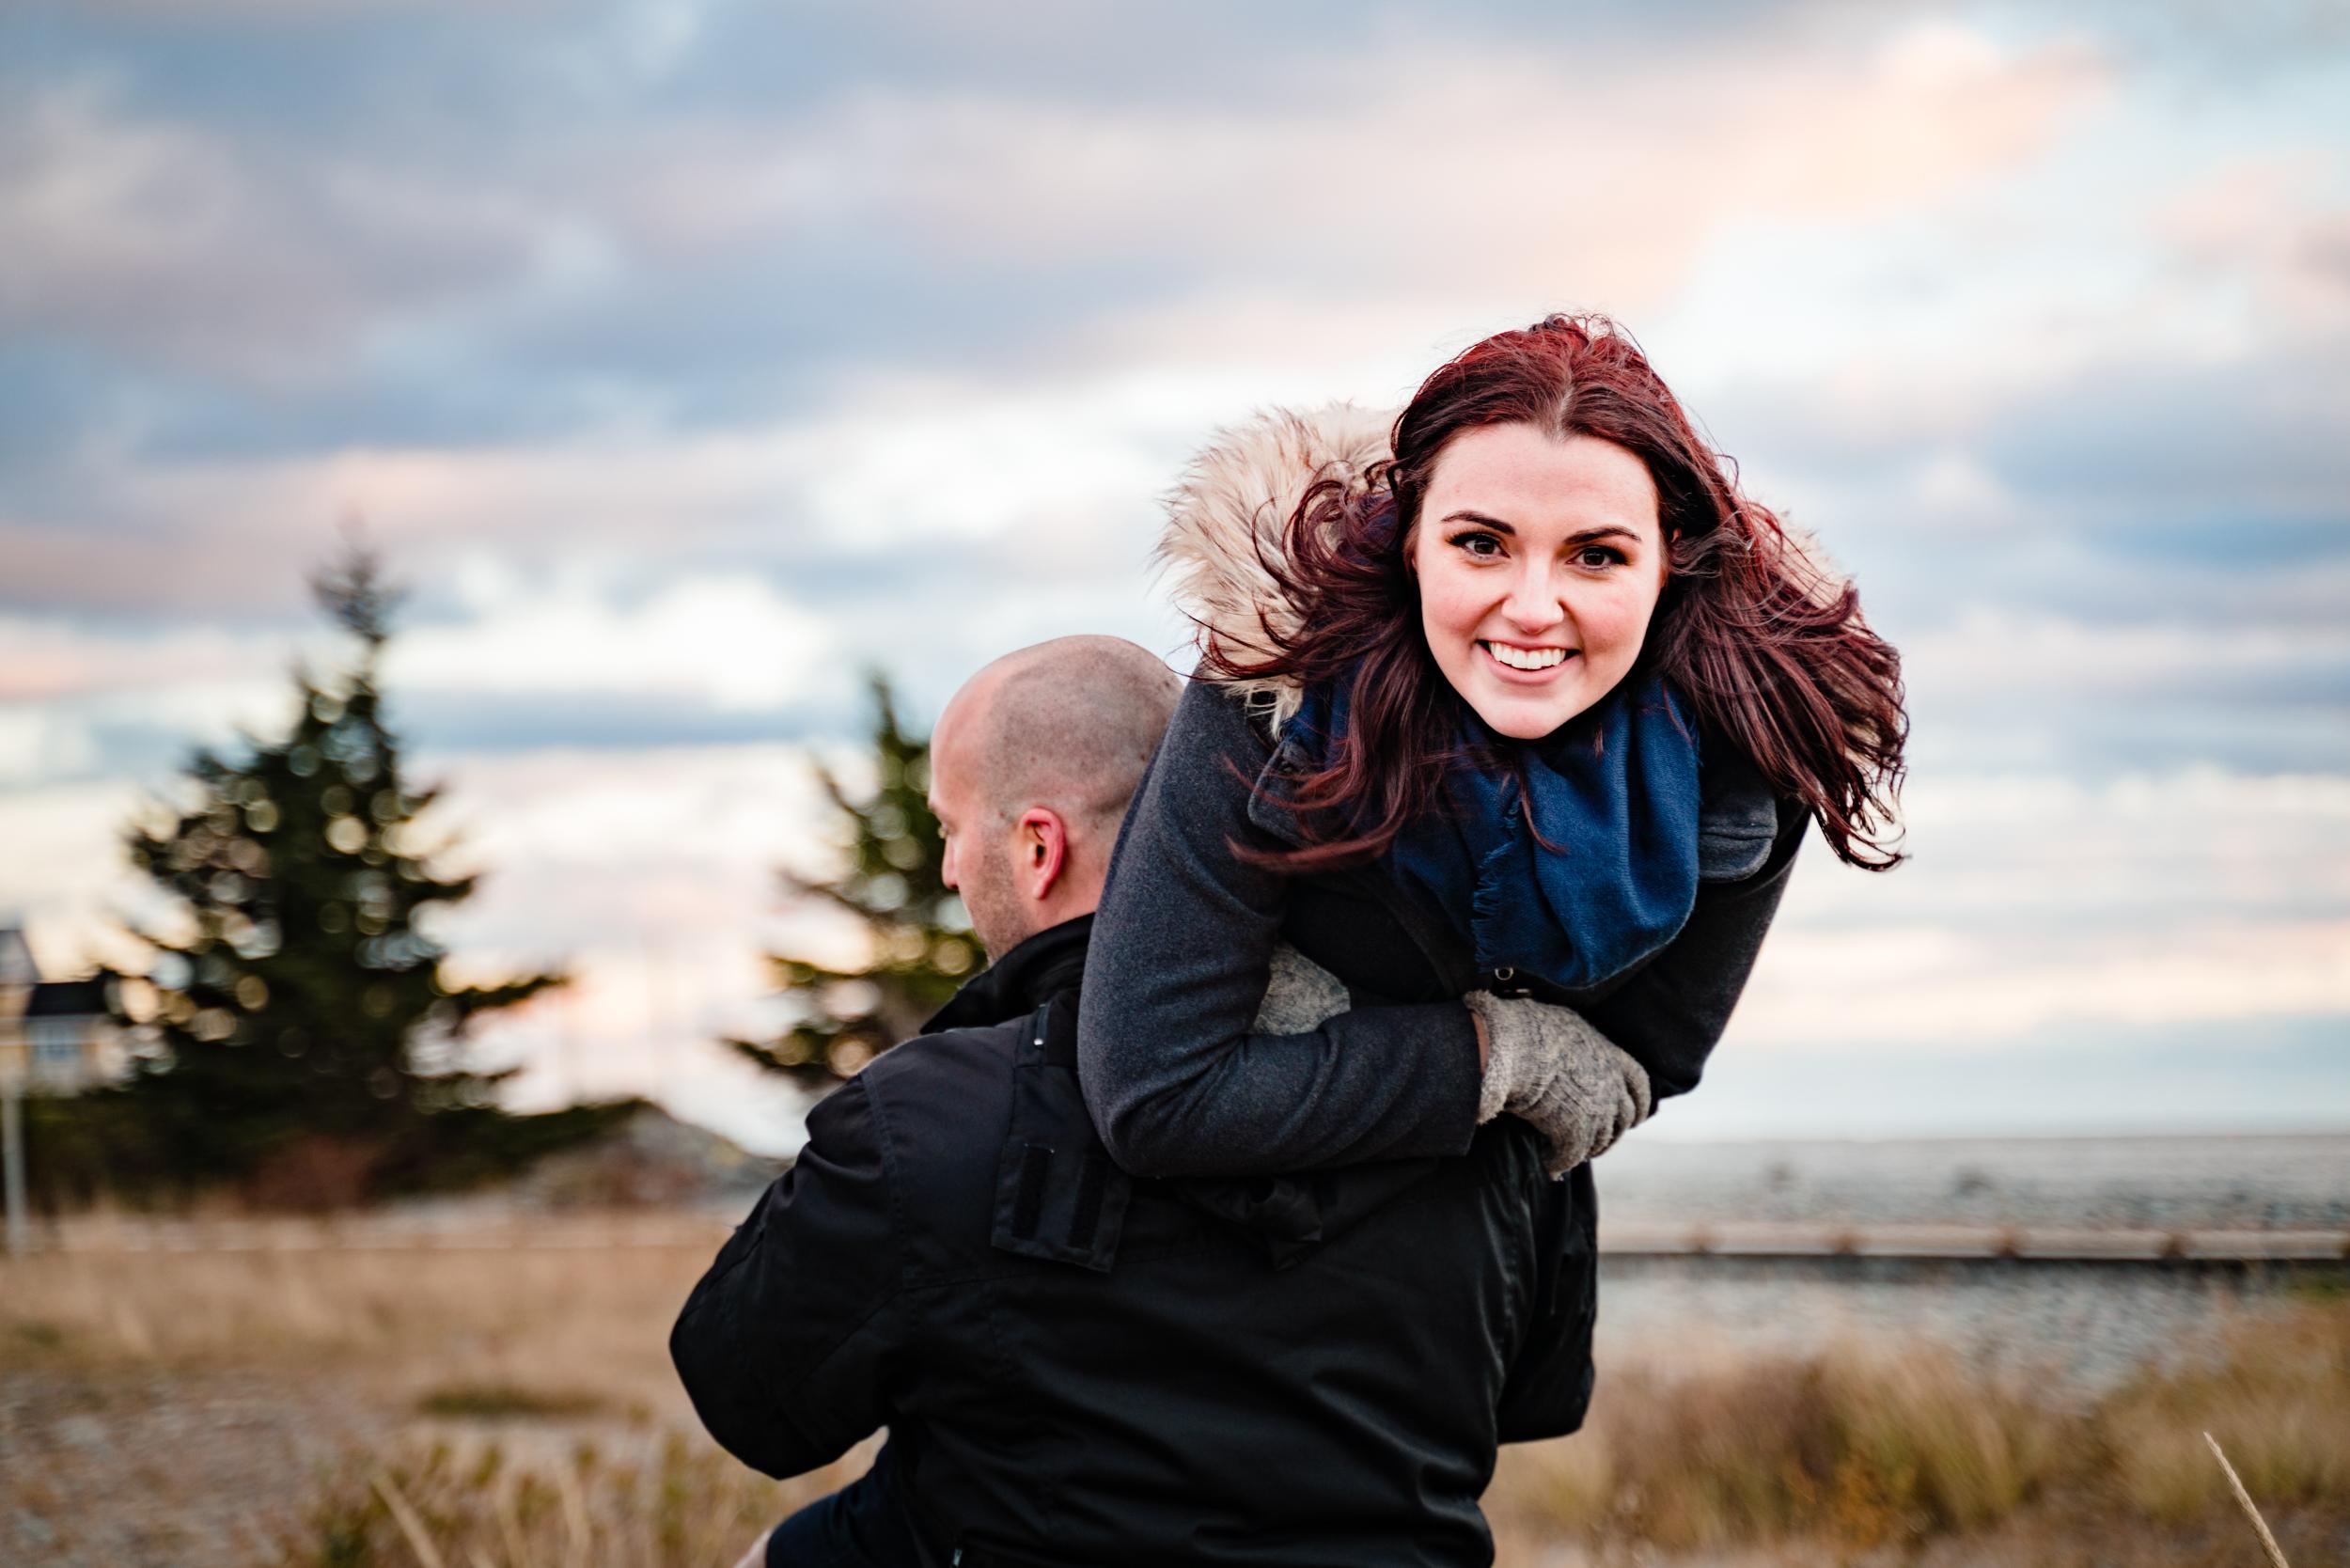 Sarah&Shayne-Halifax-engagement-weddingphotography-weddingphotographers-novascotia (40 of 41).jpg